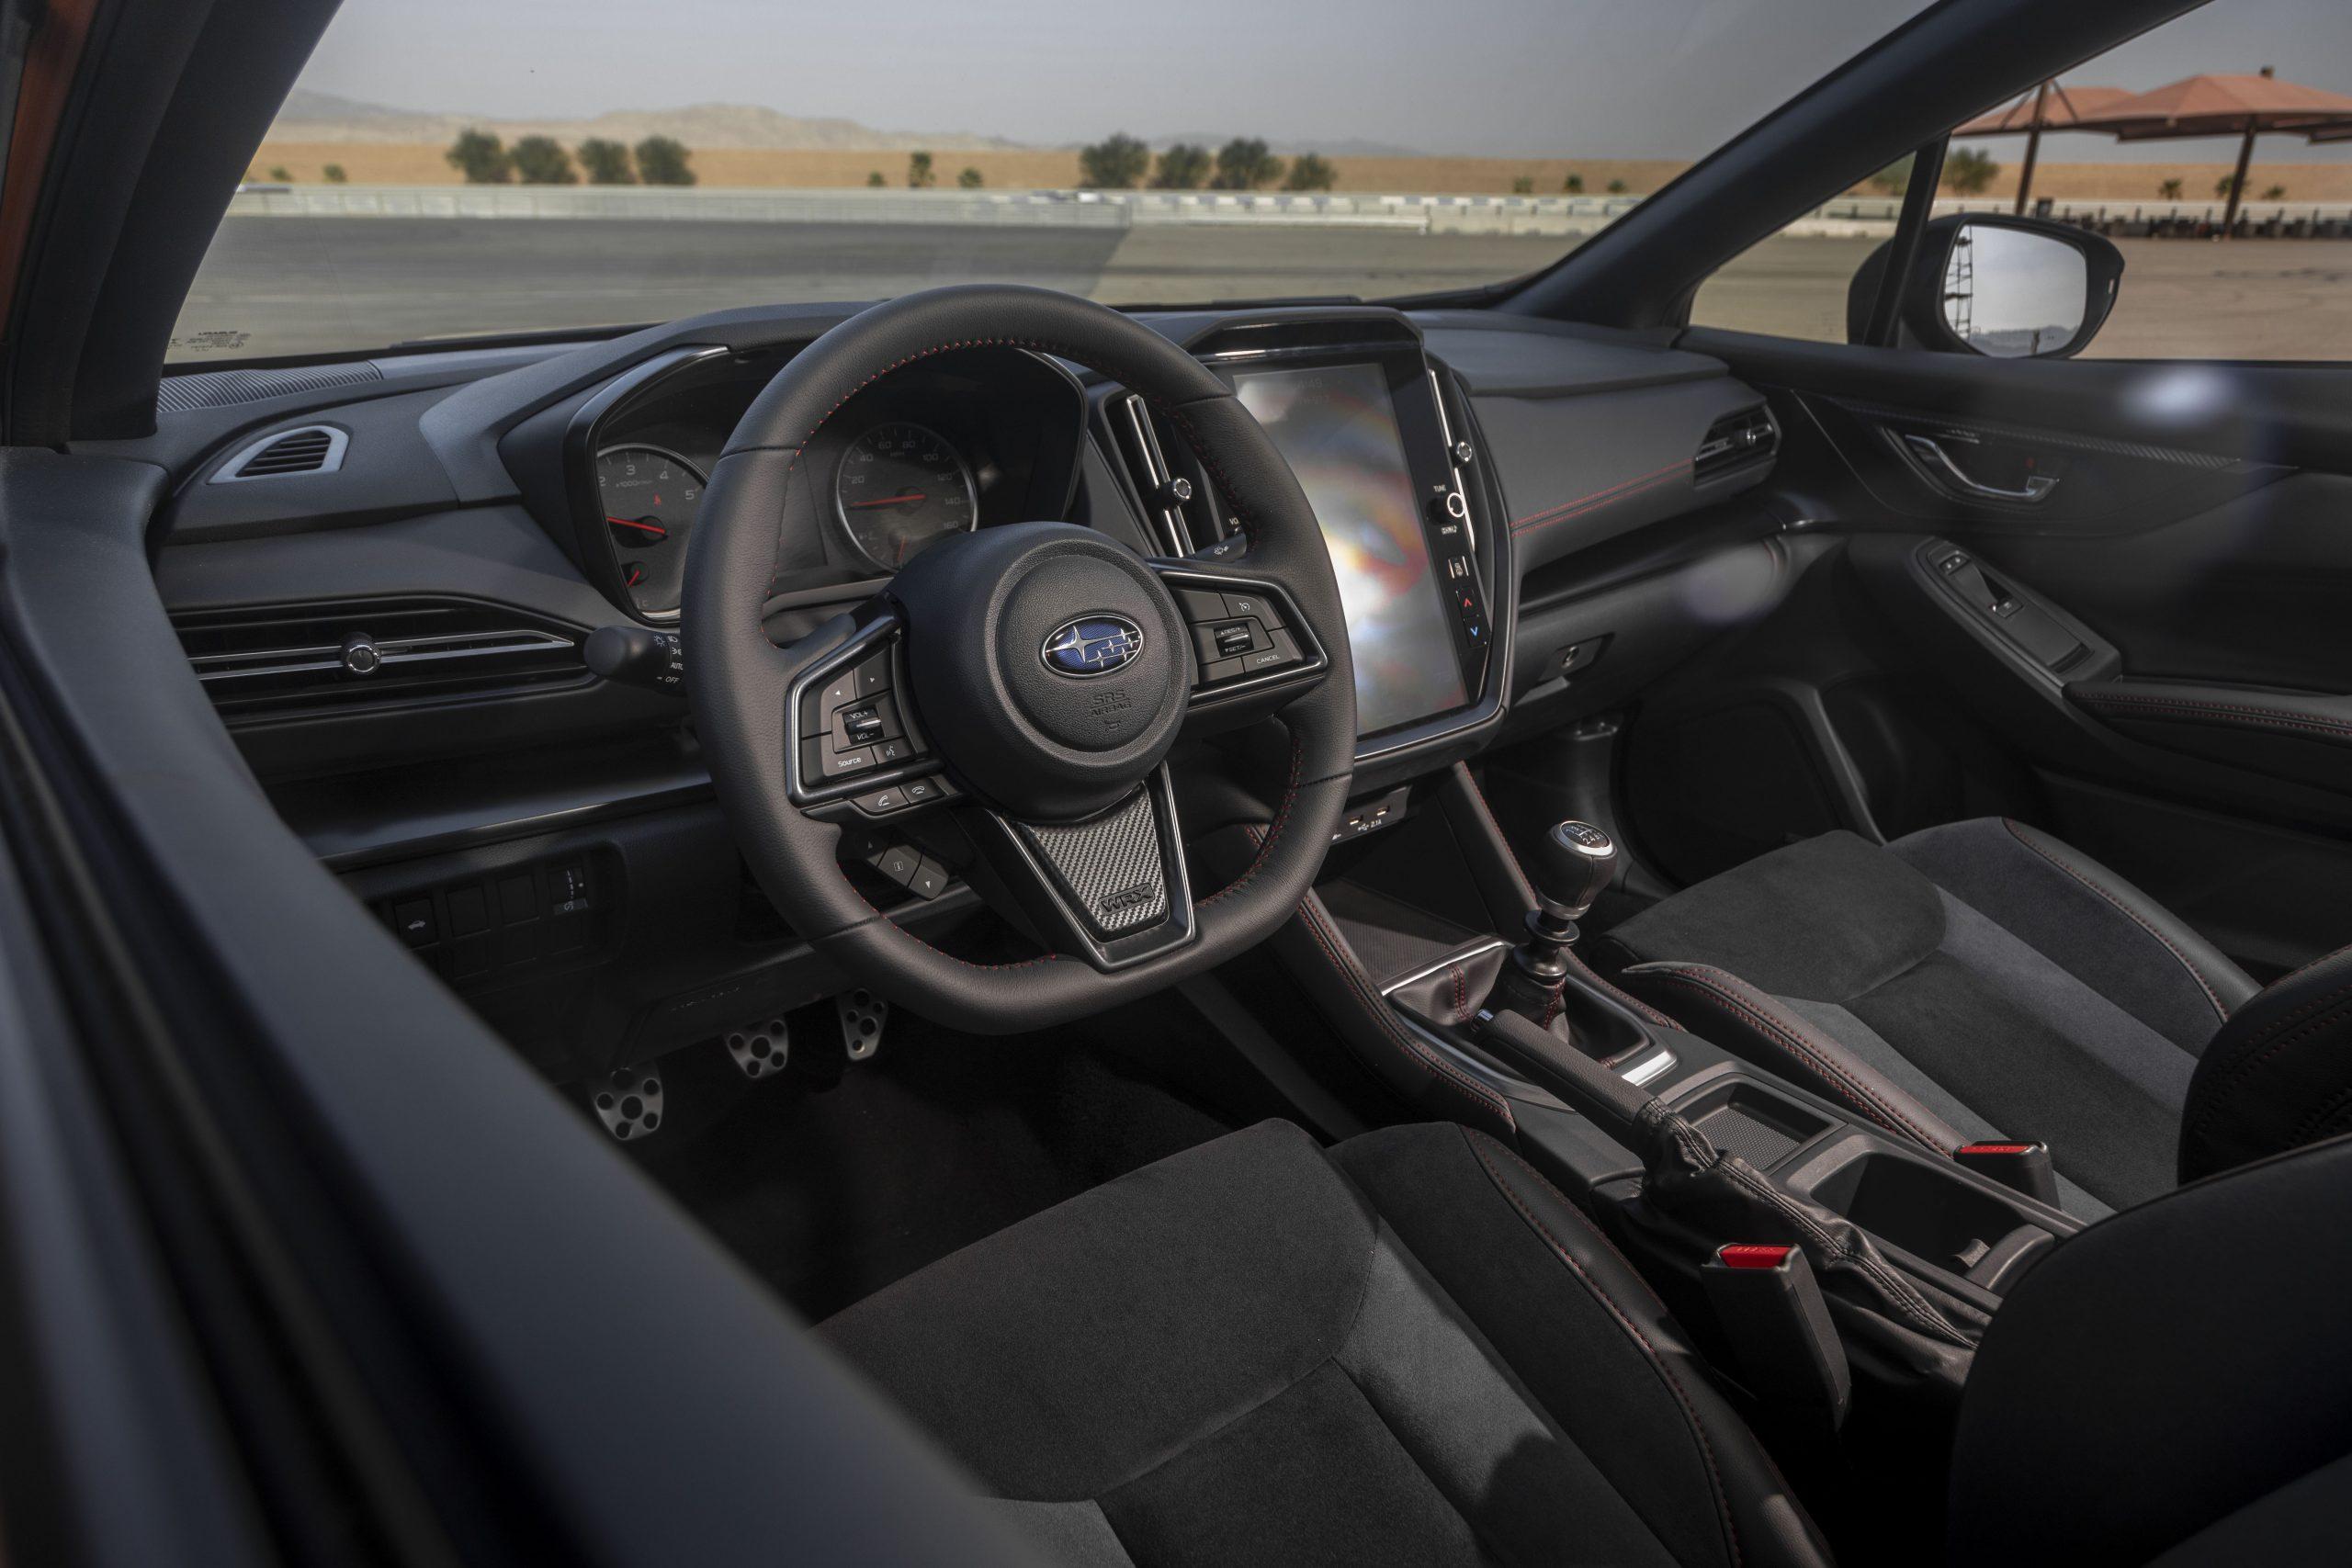 2022 Subaru WRX interior front angle